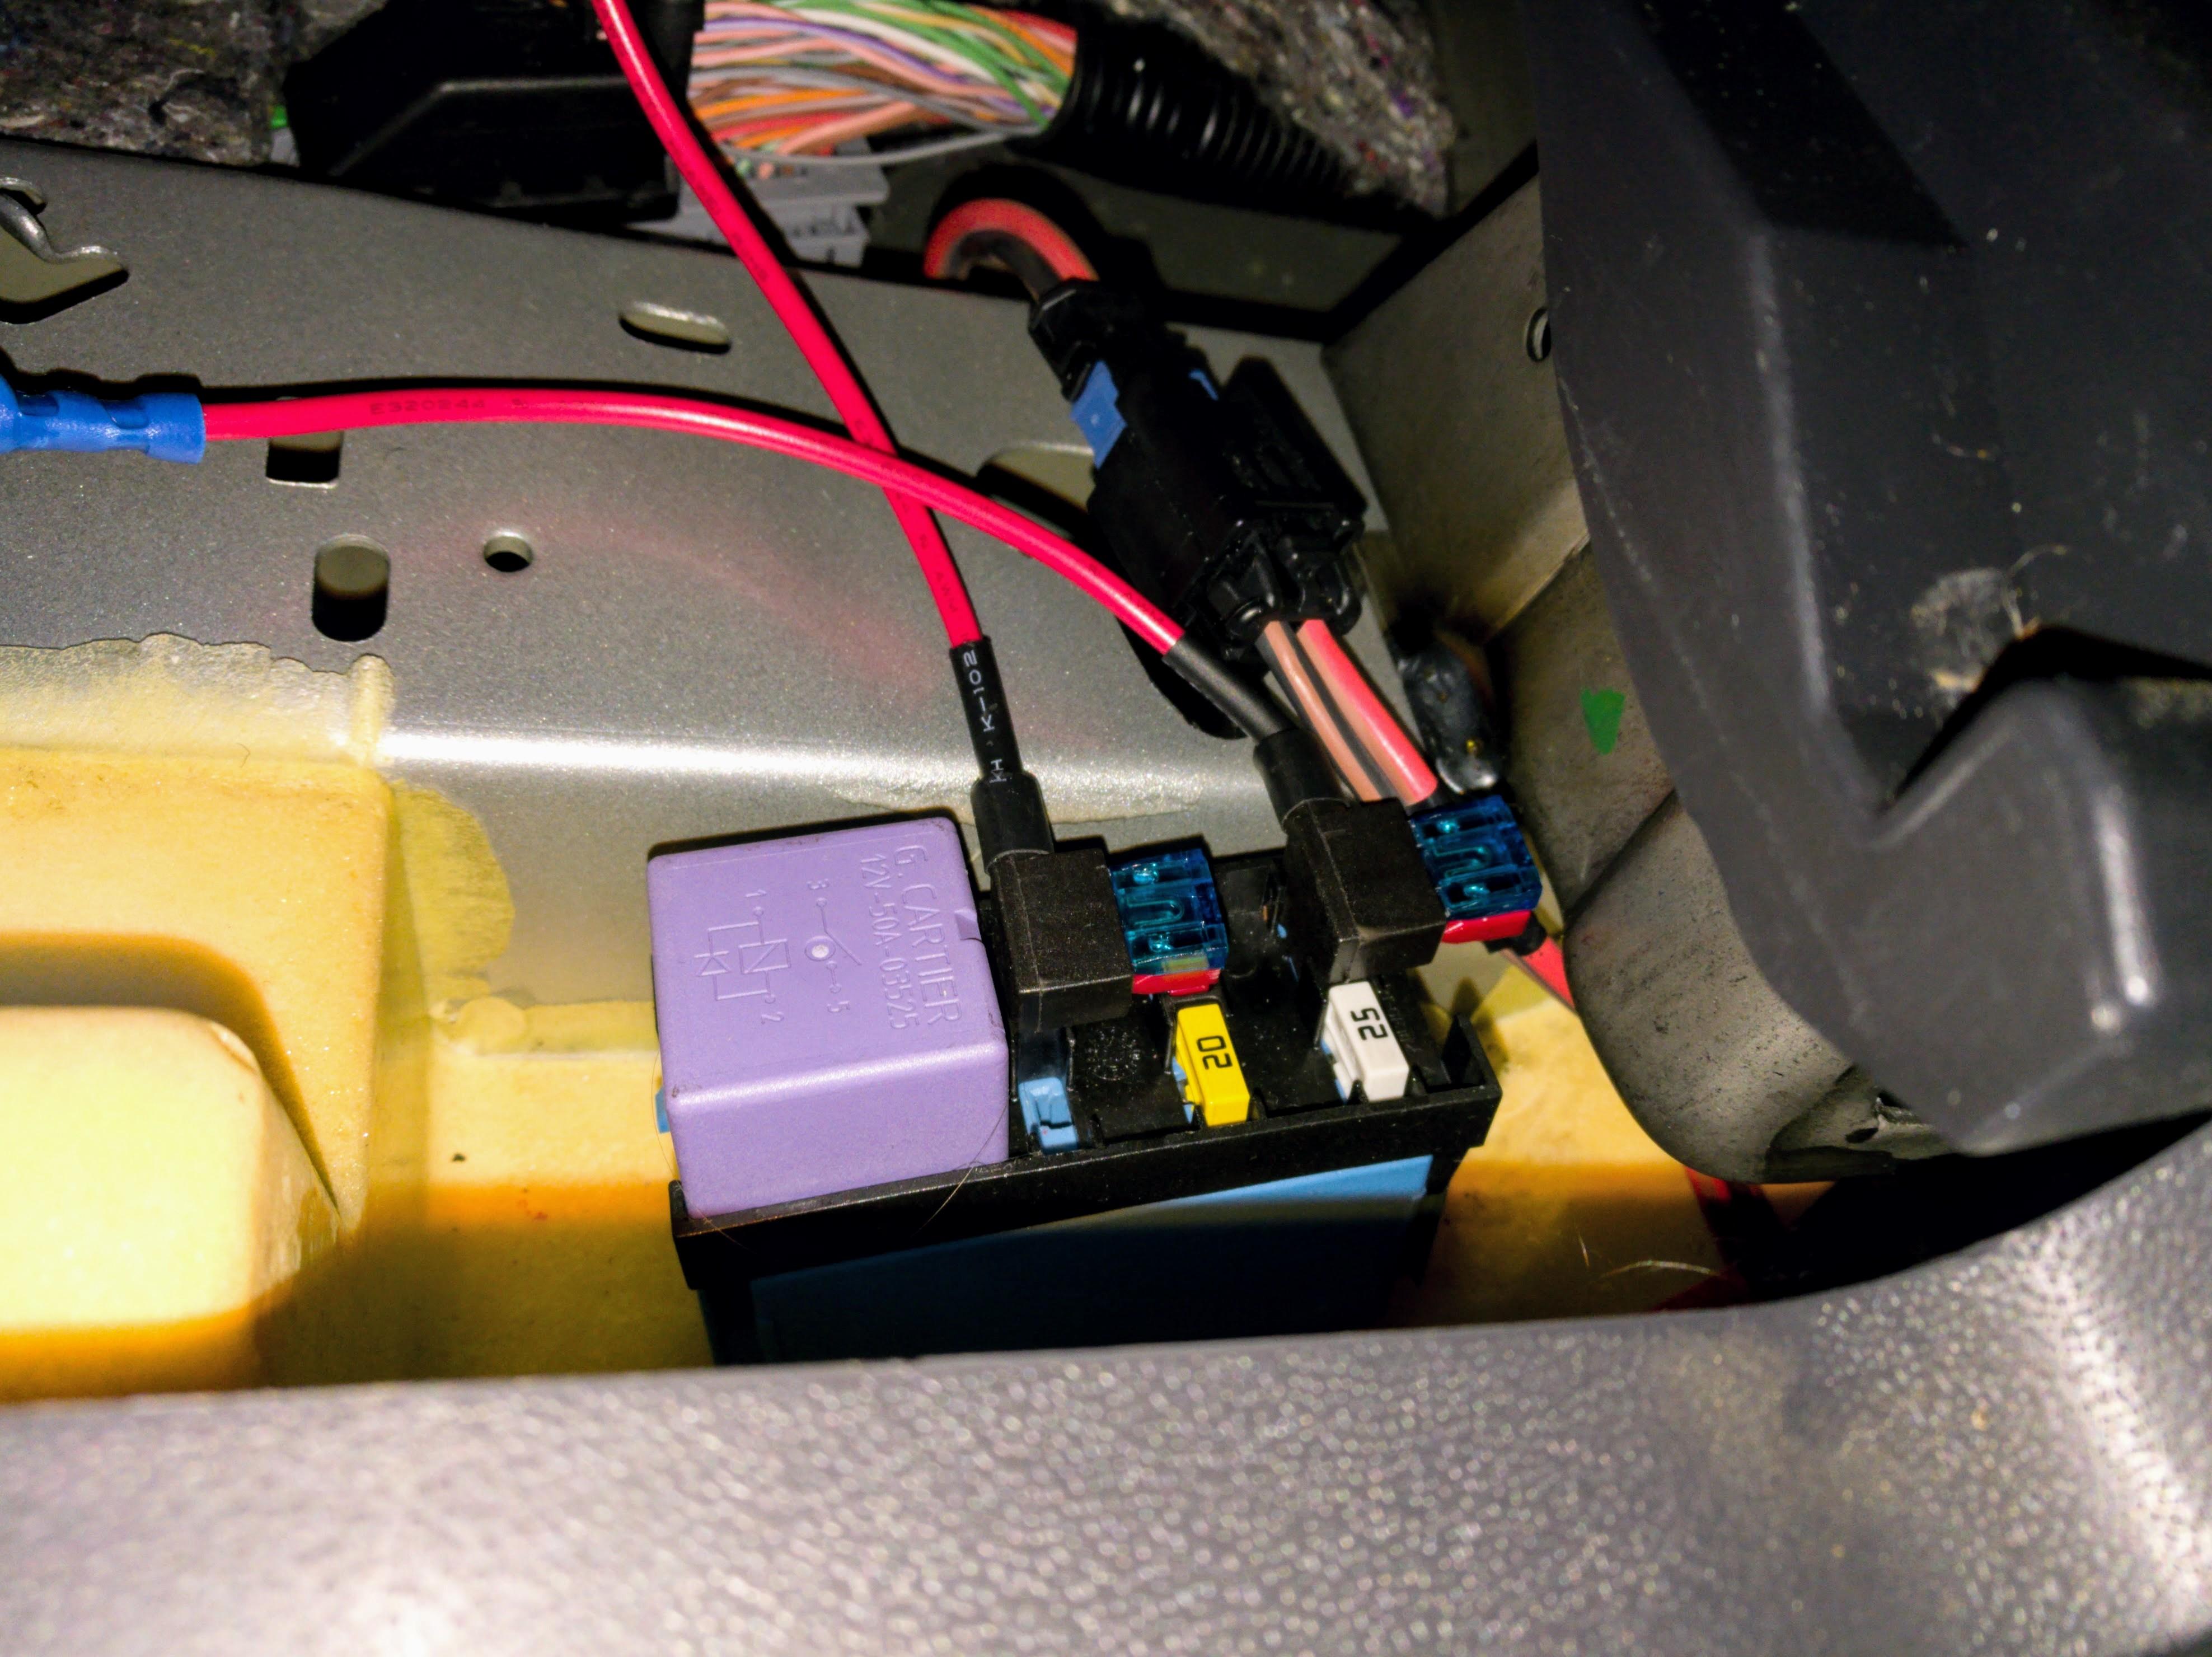 renault scenic fuse box problems - strat diagram wiring danoelectra -  doorchime.wiringdol.jeanjaures37.fr  wiring diagram resource